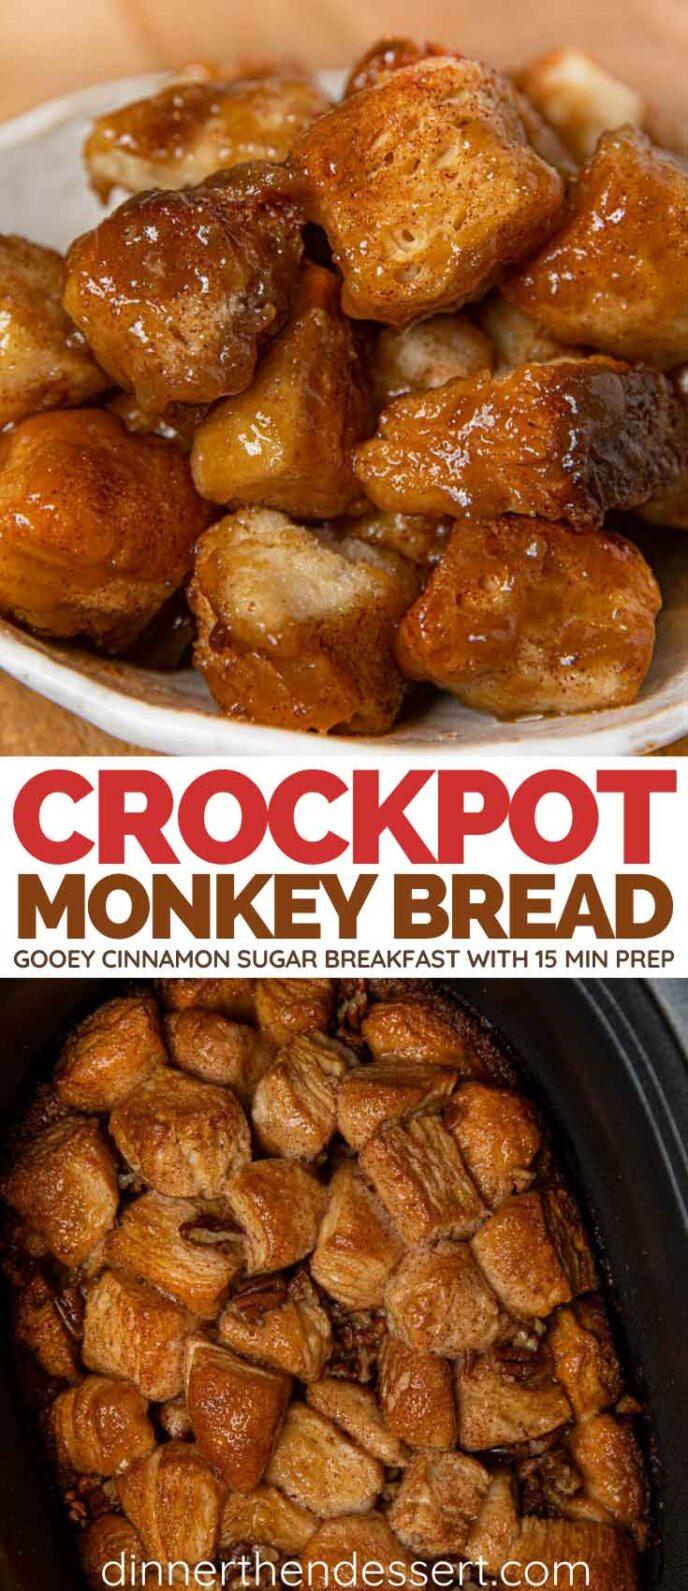 Crock Pot Monkey Bread collage